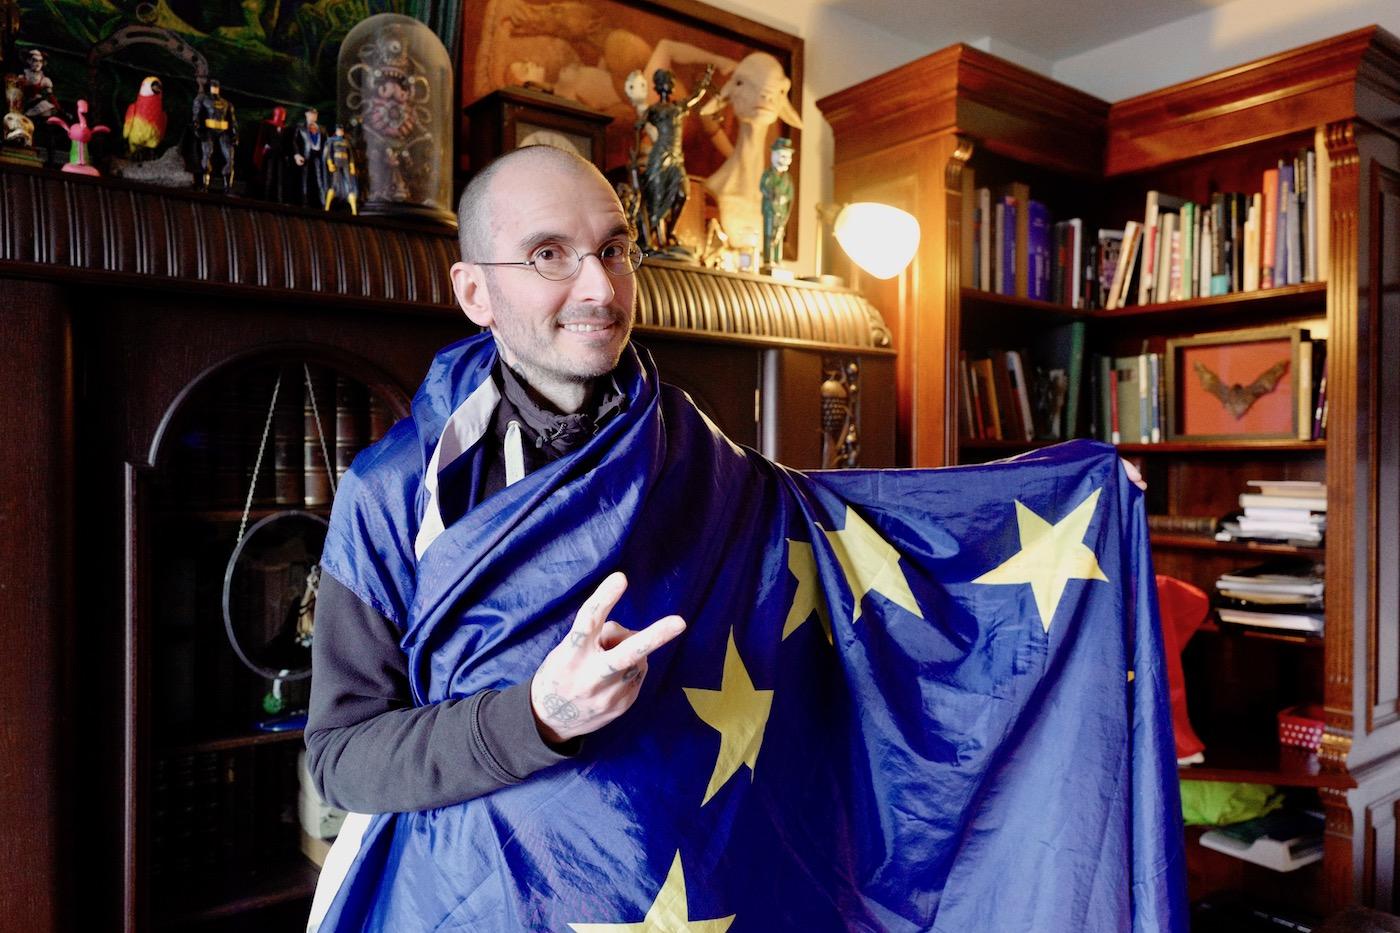 mark_benecke_europa - 39.jpg